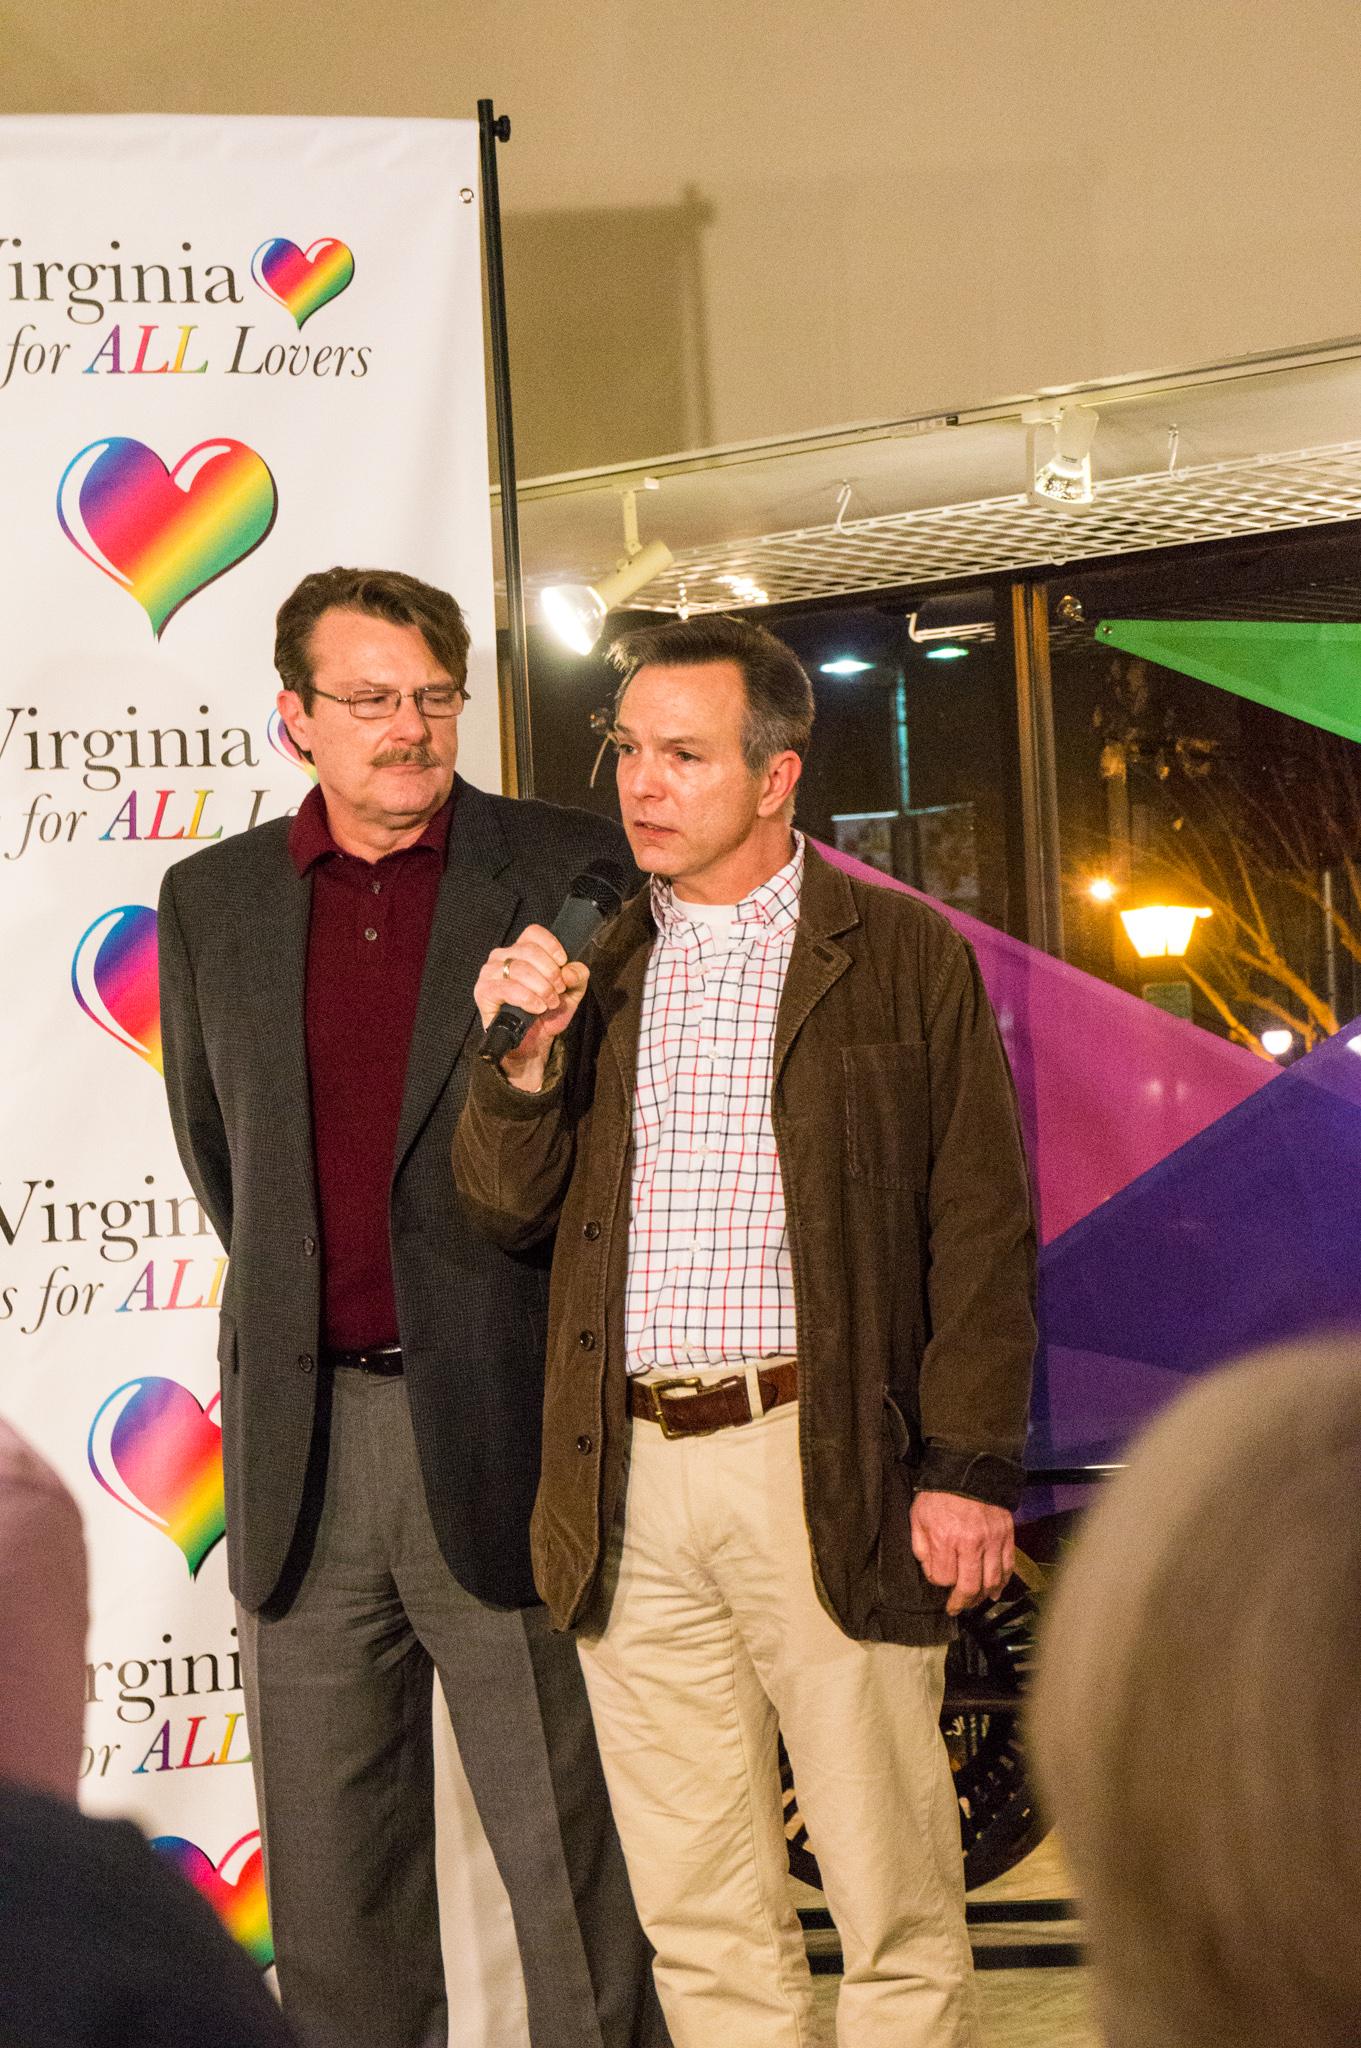 Tony London and Tim Bostic